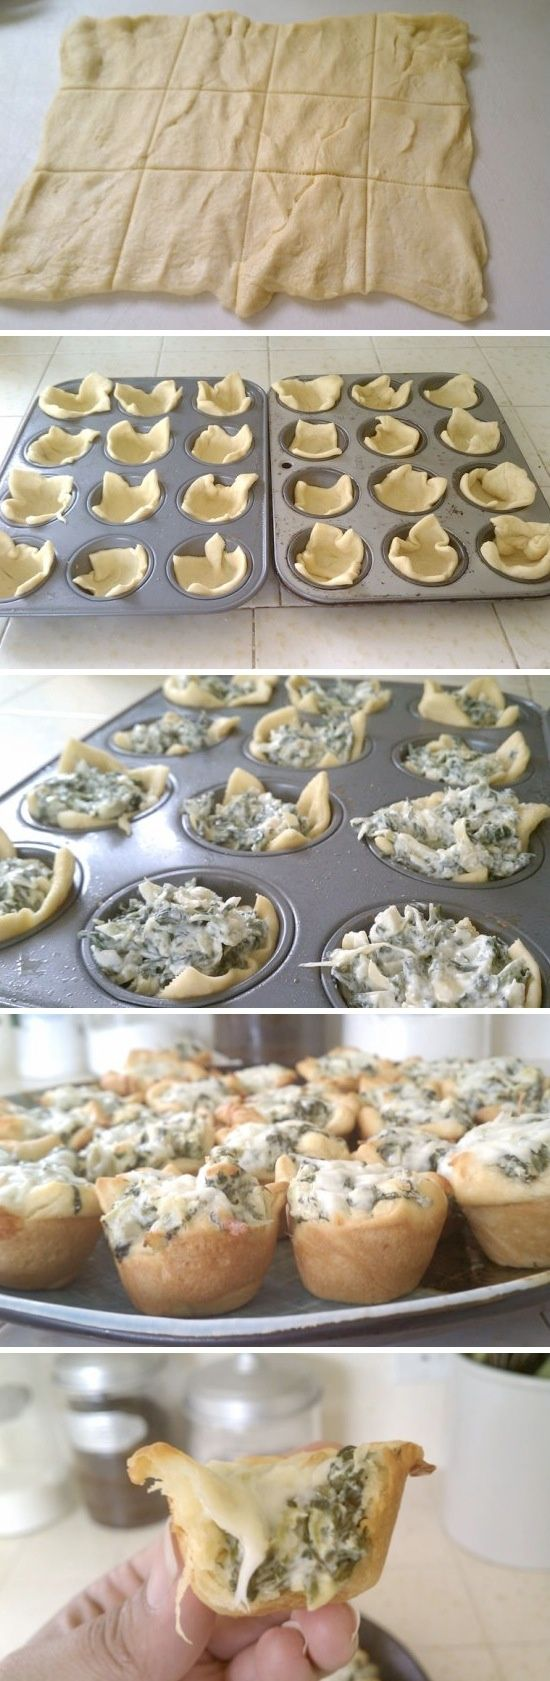 Spinach Artichoke Bites | Park House Love